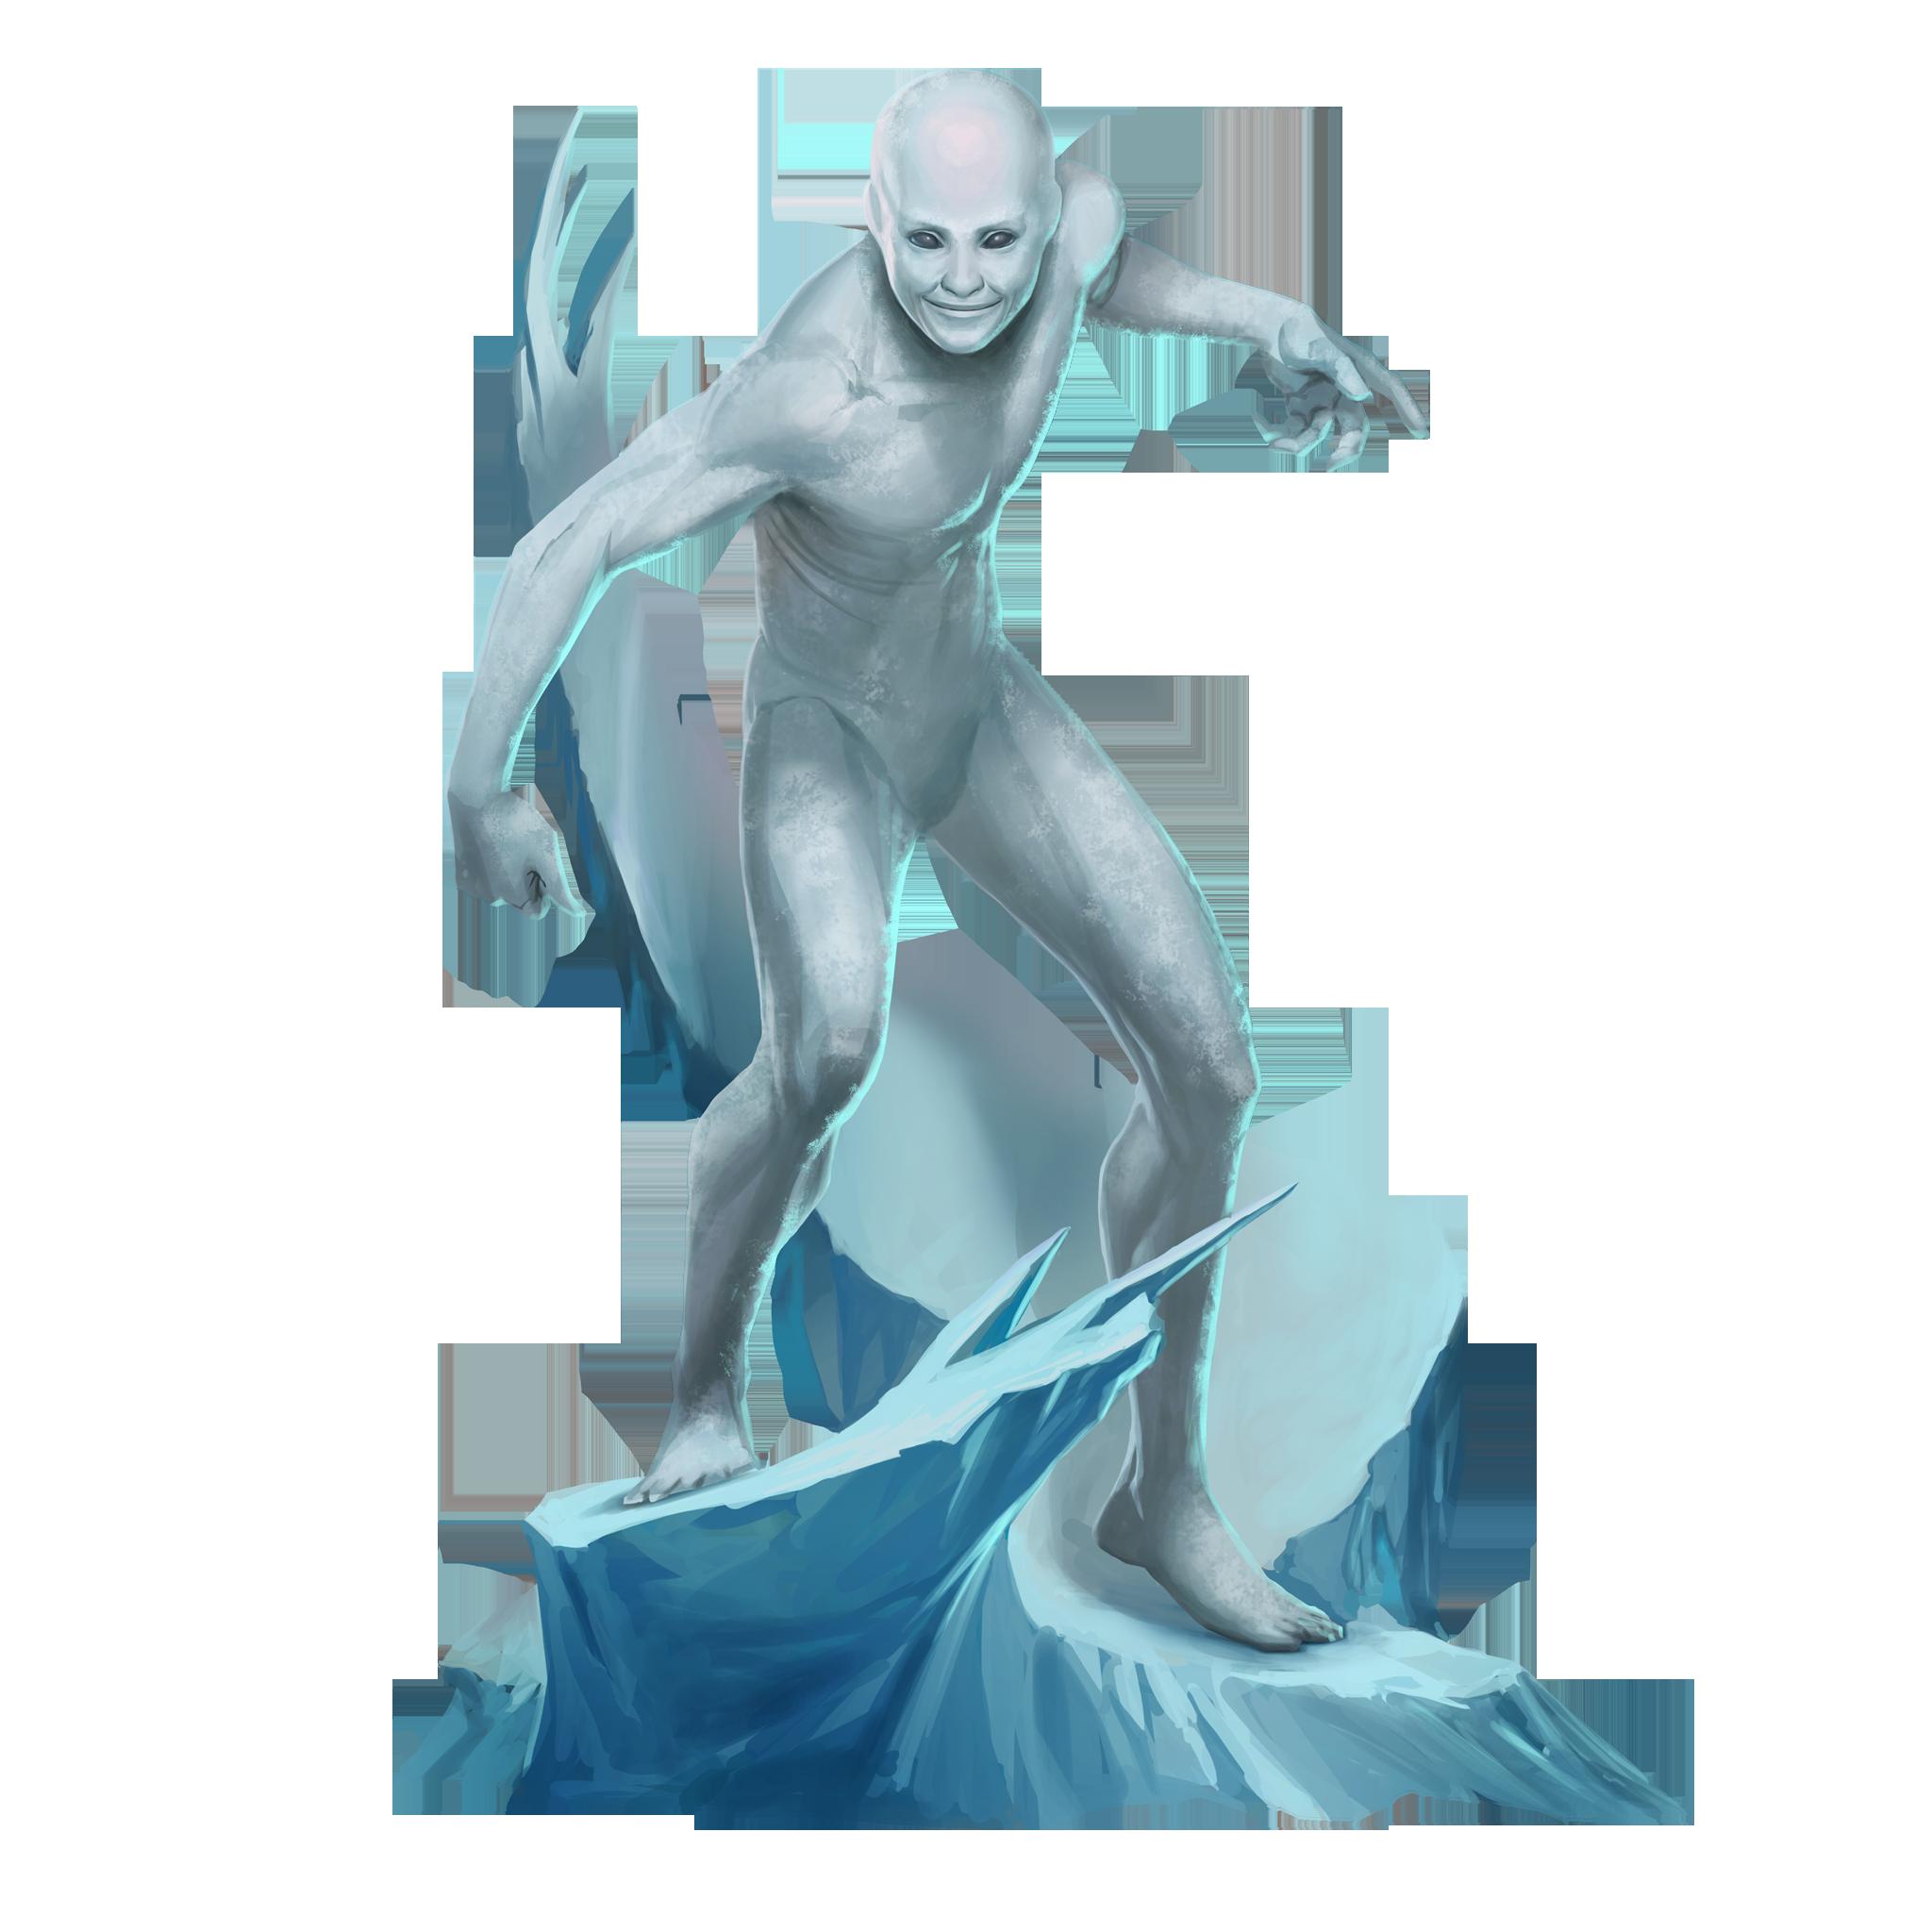 Iceman #Clip #Art. (Puzzle Quest) ÅWESOMENESS!!!™ ÅÅÅ+.